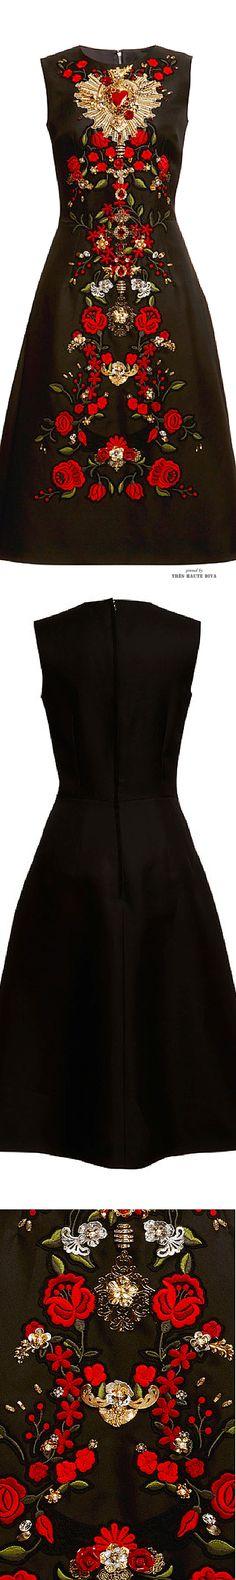 Dolce & Gabbana Sleeveless Gazar Embellished A-Line Dress SS 2015